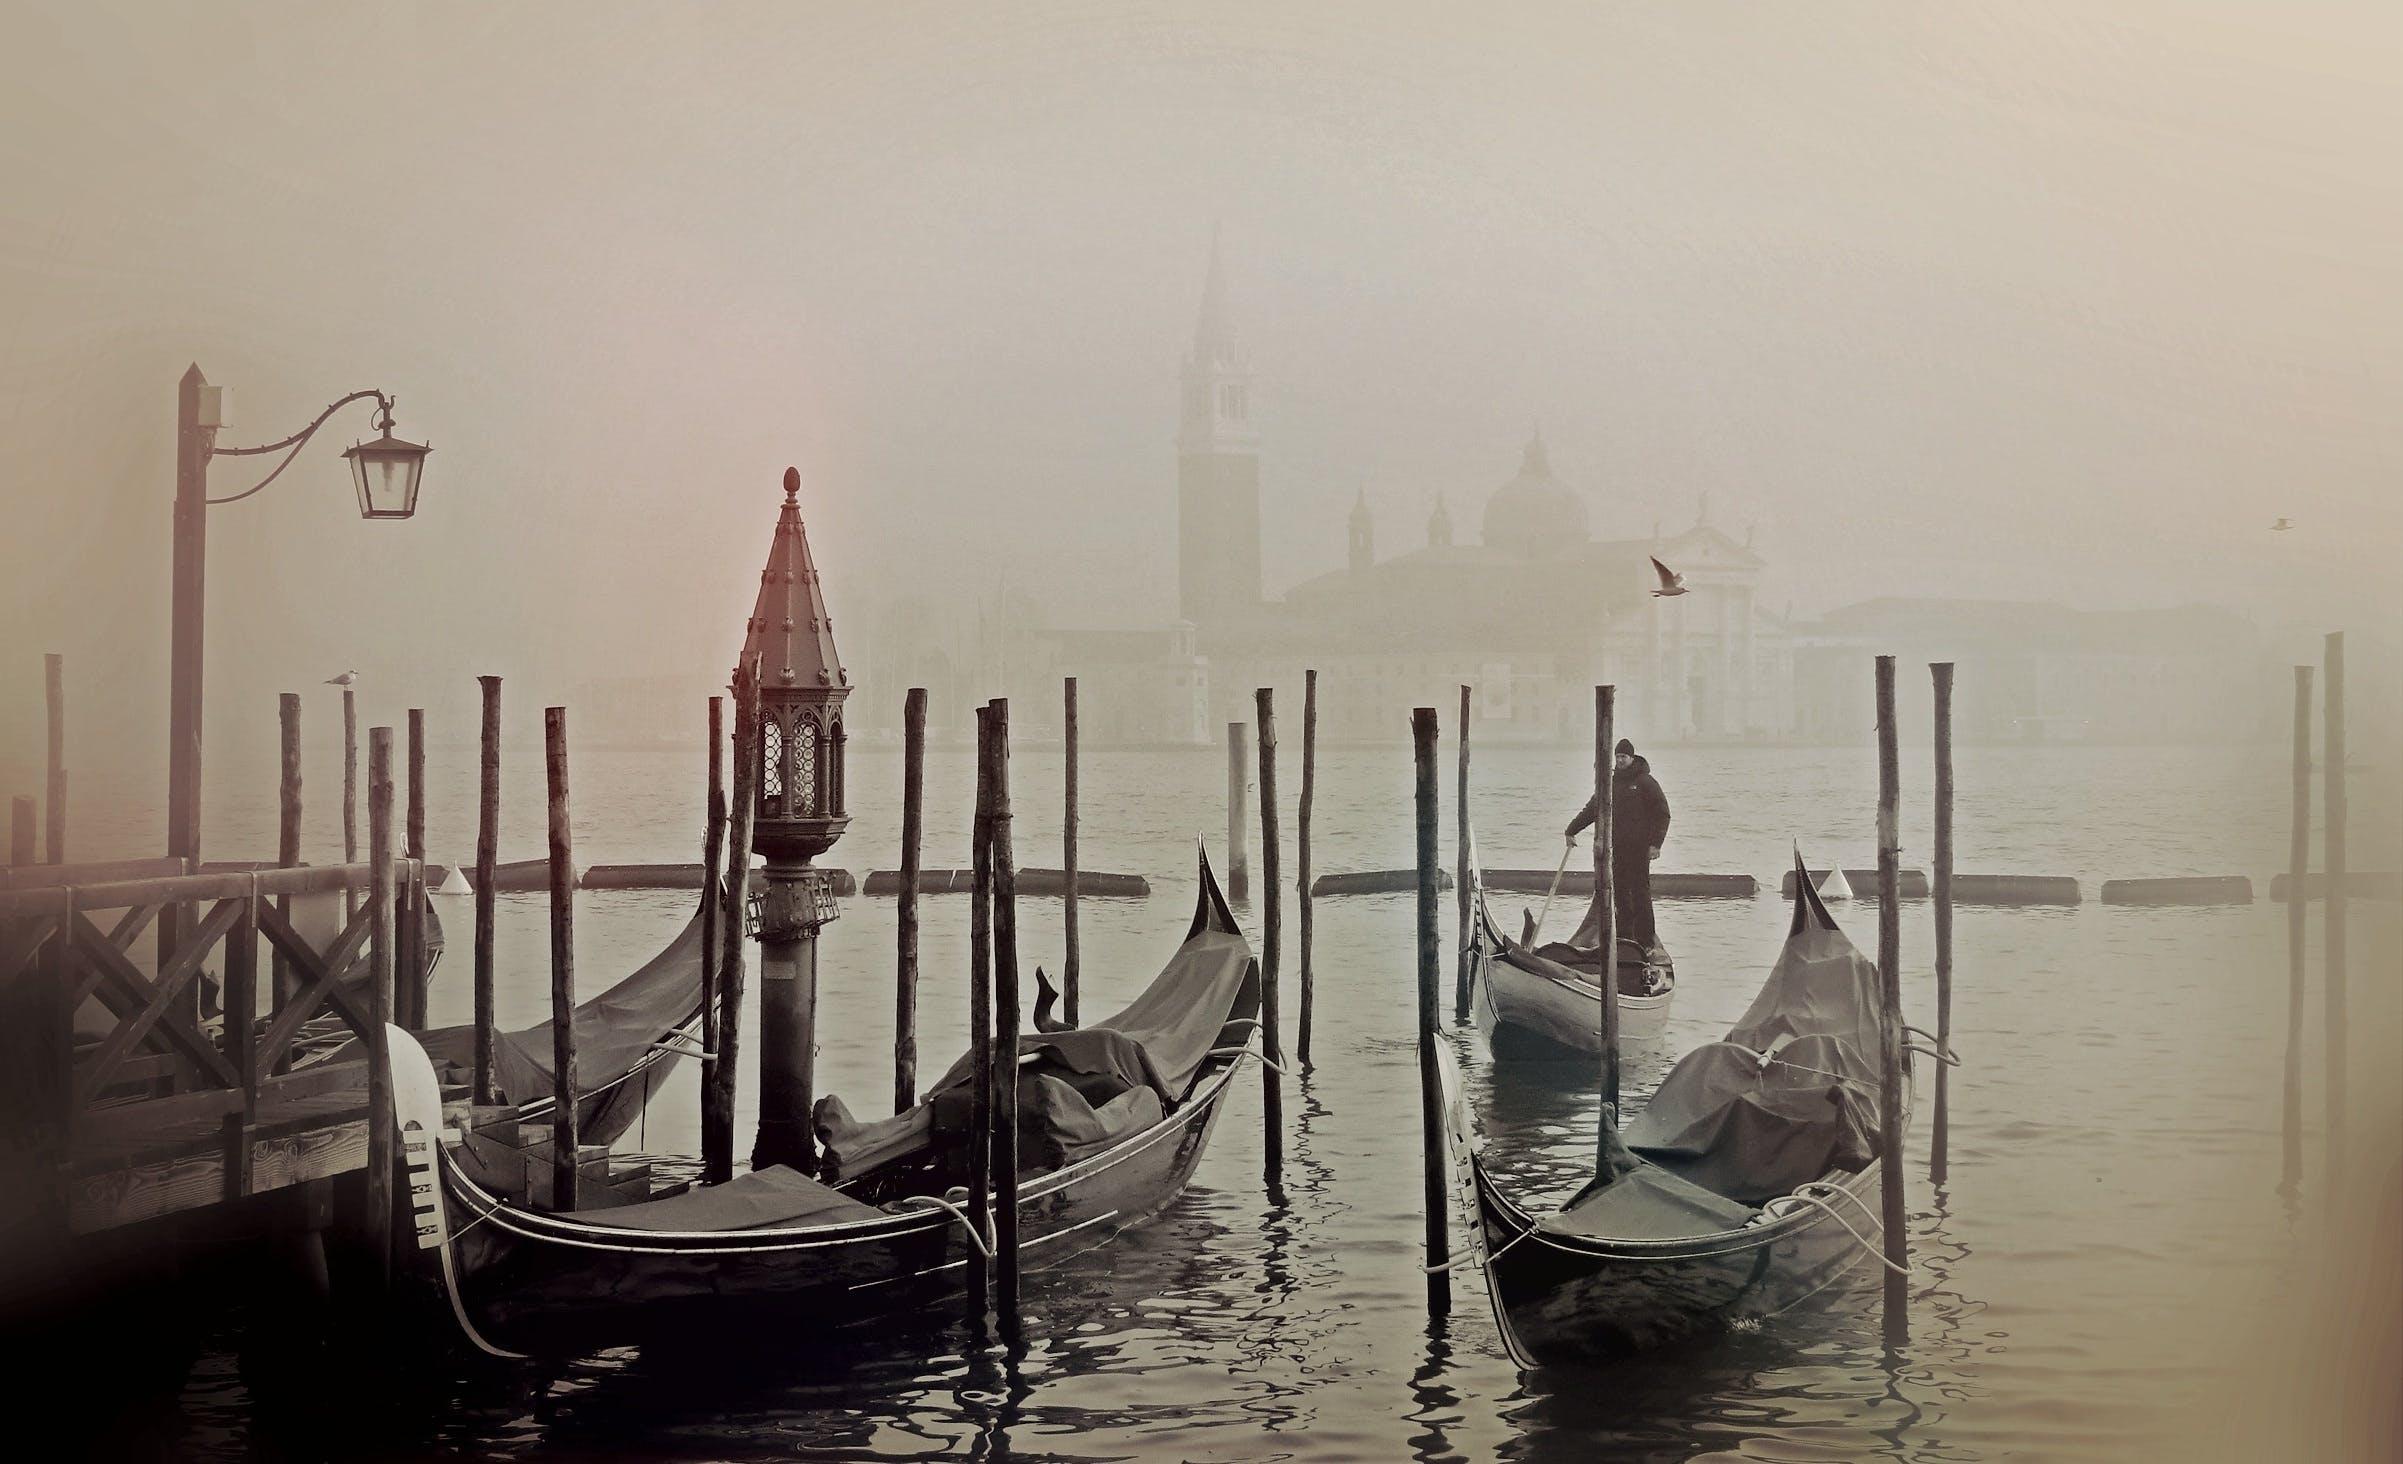 Kostenloses Stock Foto zu boote, gondeln, italien, nebel